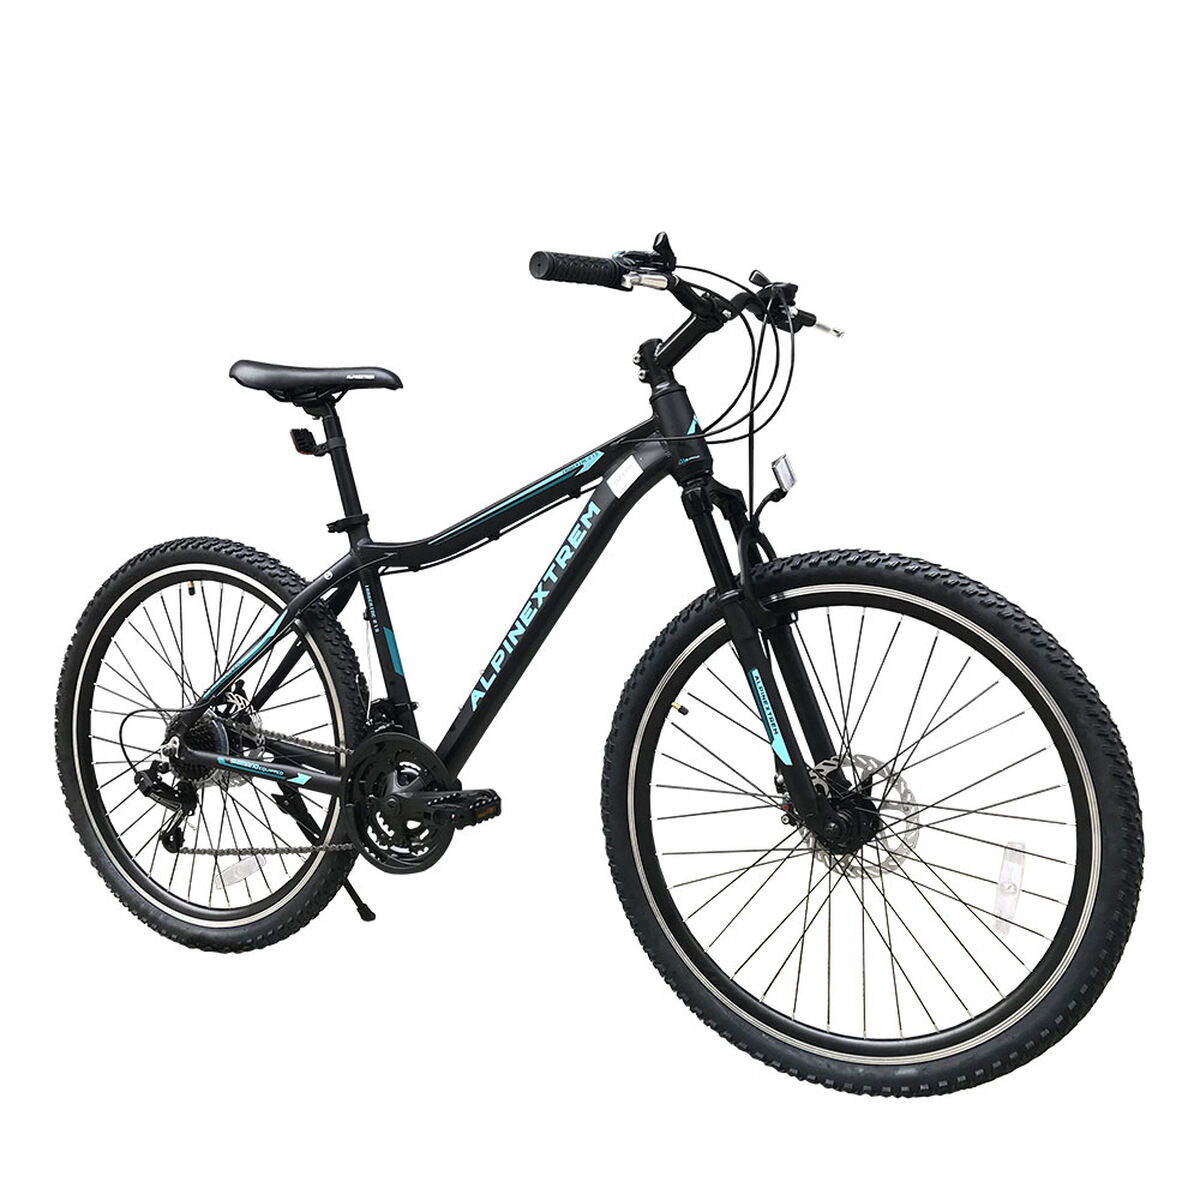 Bicicleta Alpinextrem Mujer Tangerine Aro 27.5 Morada